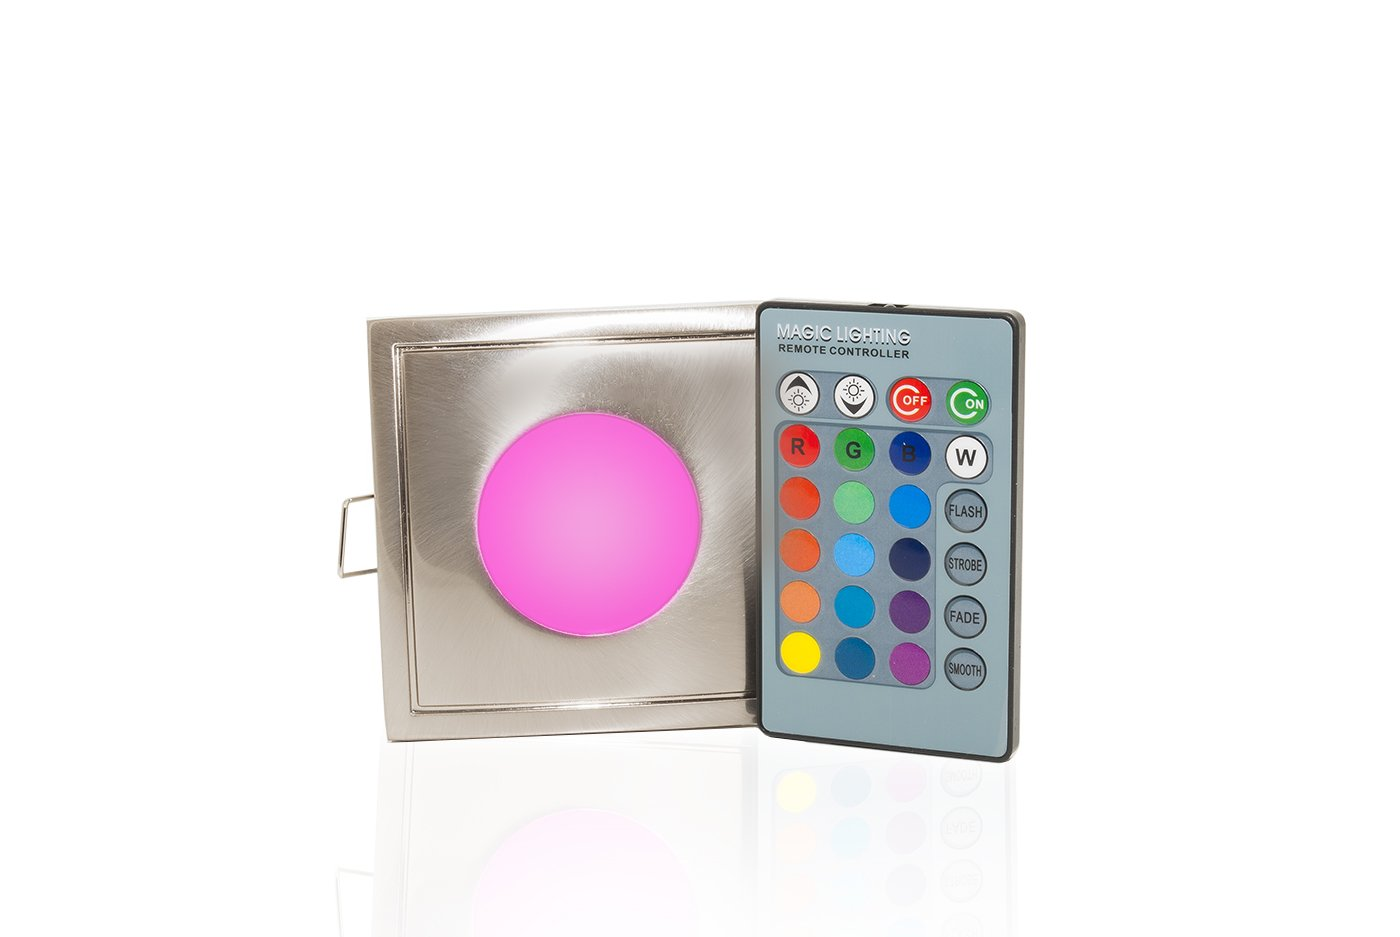 Faretto LED 12v RGB 3W tenuta stagna IP65 cromoterapia doccia bagno turco sauna Planetitaly